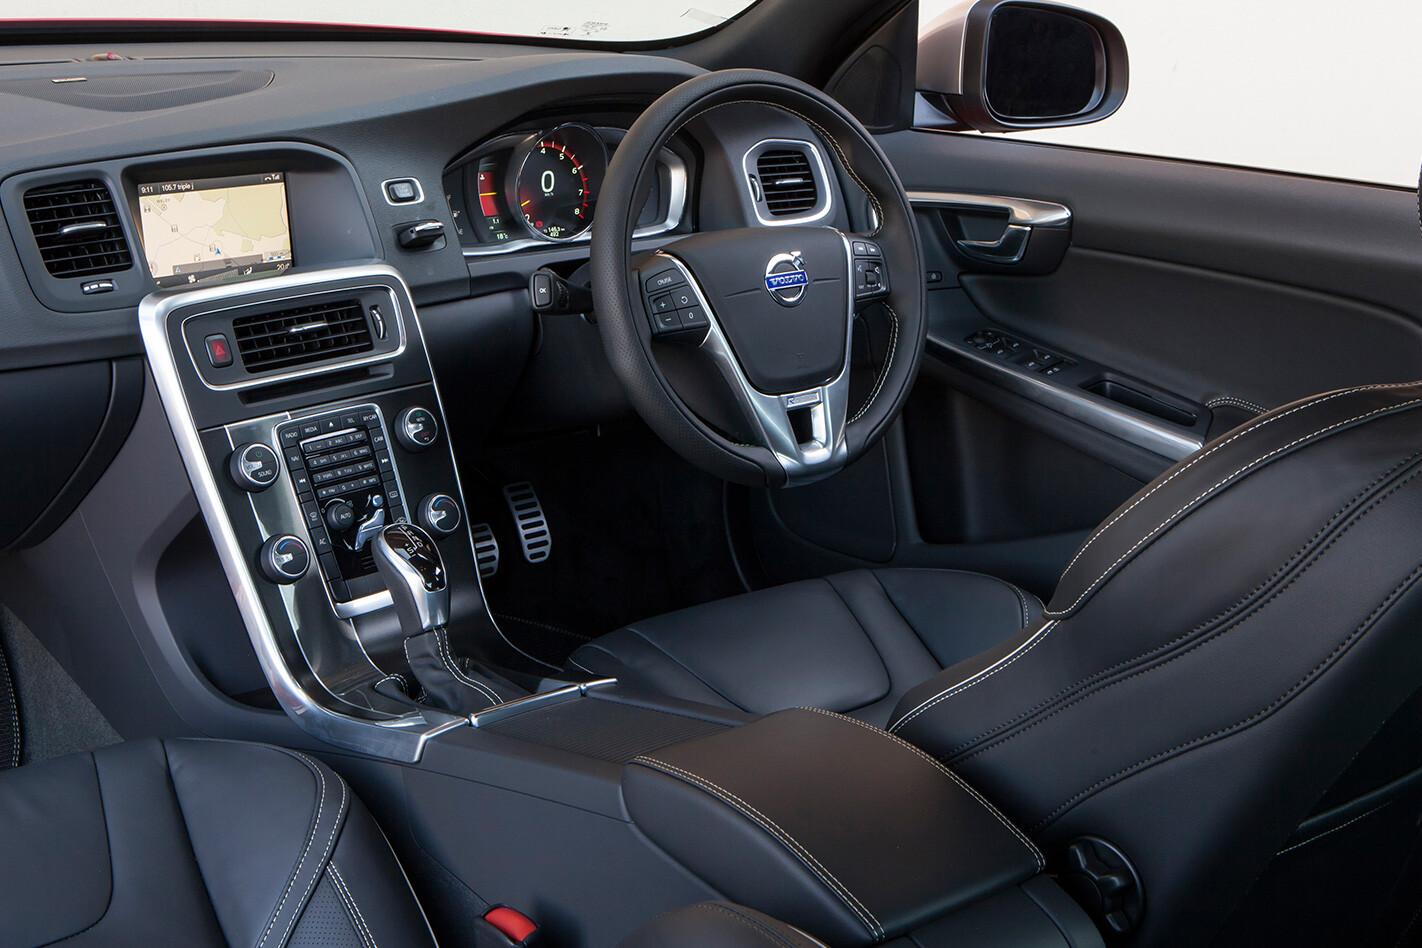 2016 Volvo S60 R-Design interior